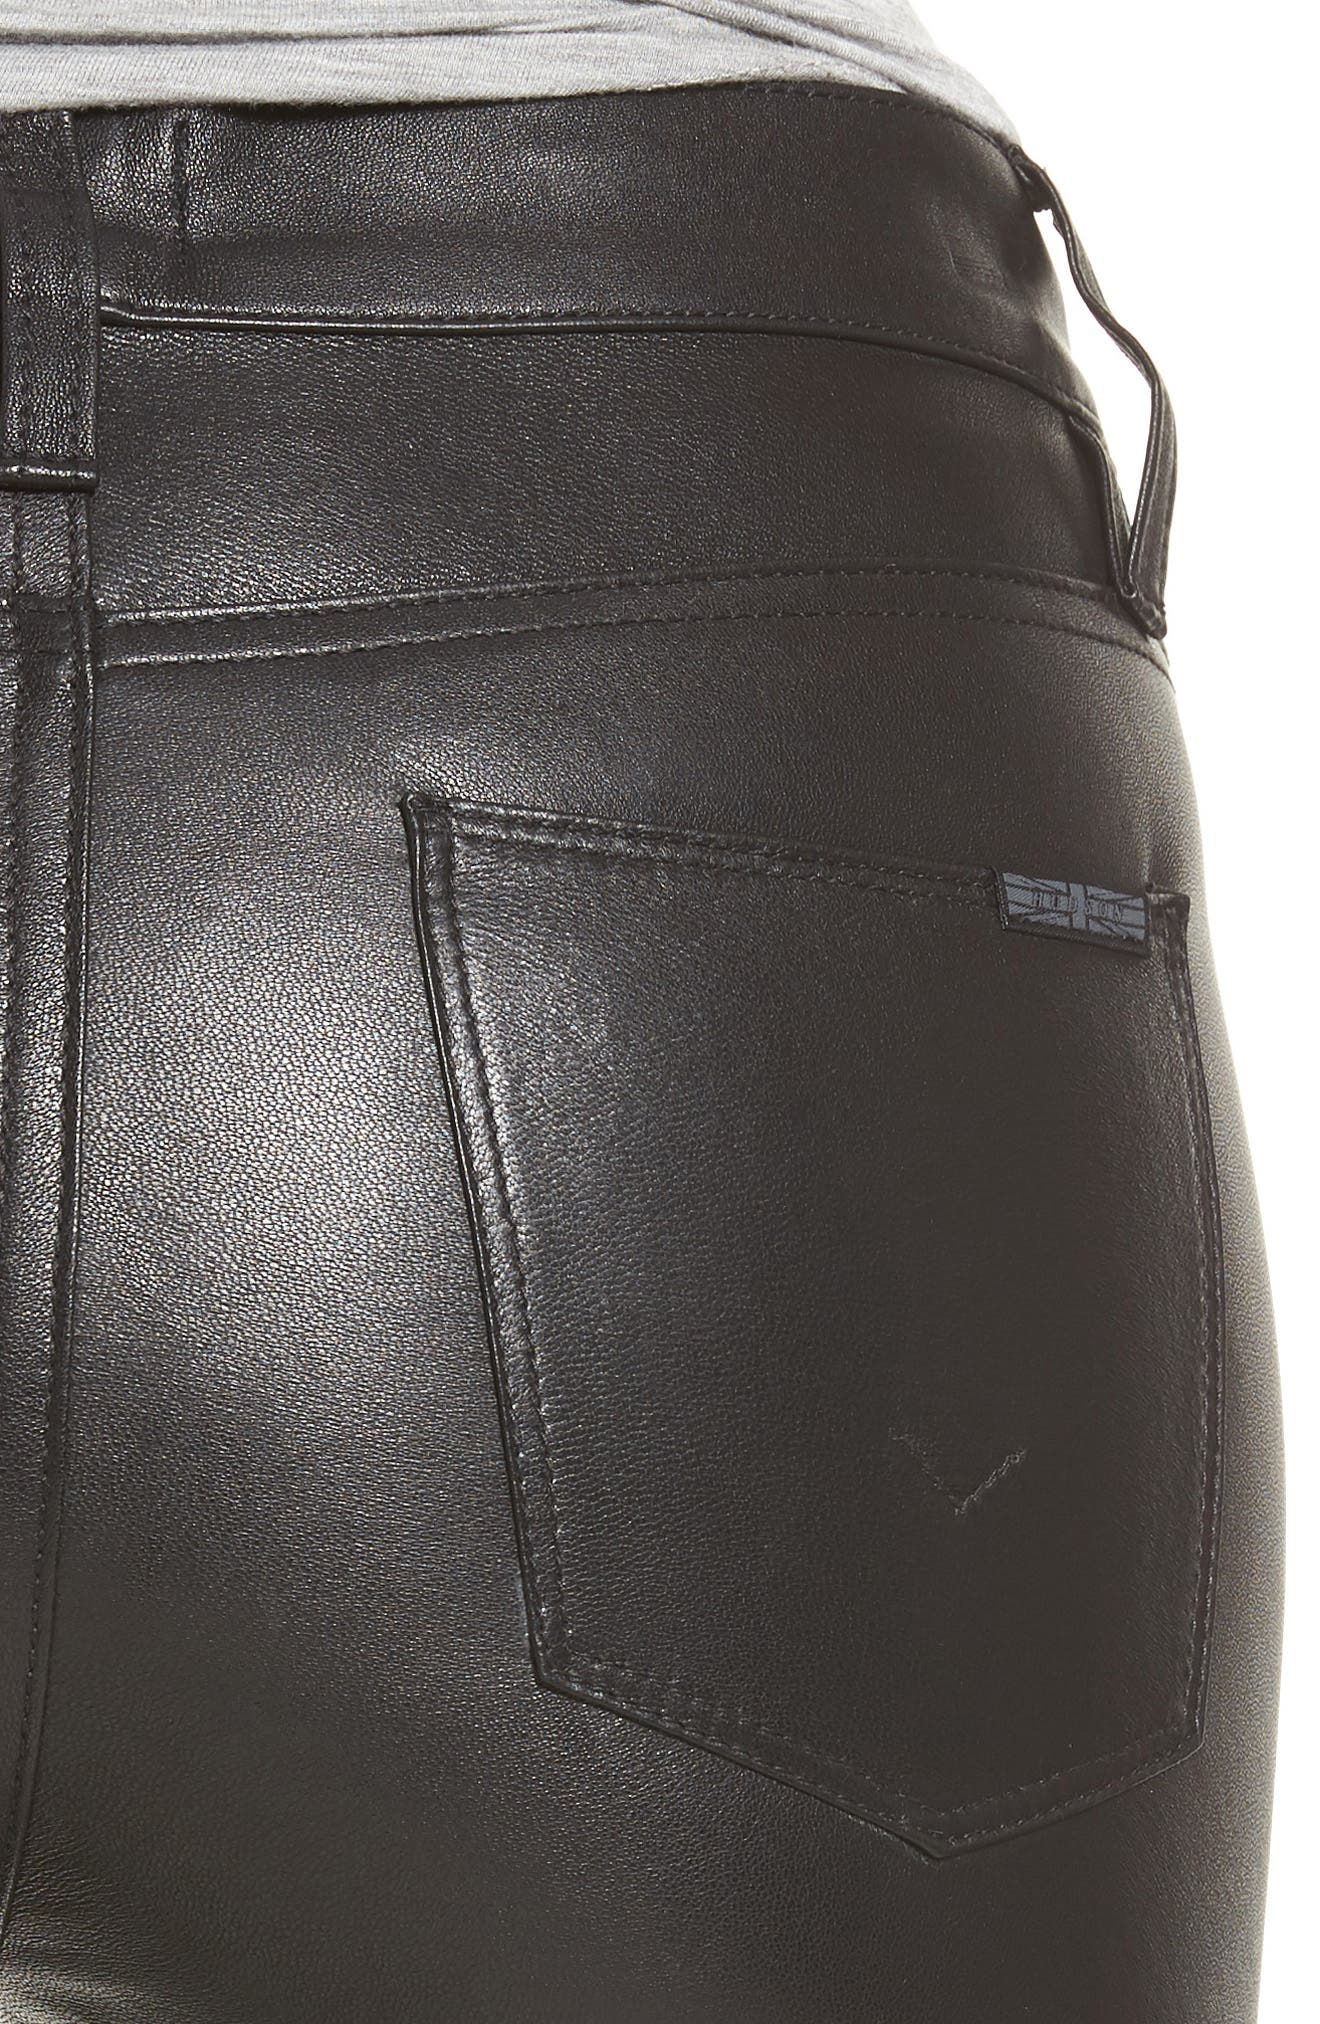 Barbara High Waist Ankle Skinny Leather Pants,                             Alternate thumbnail 4, color,                             Black Leather